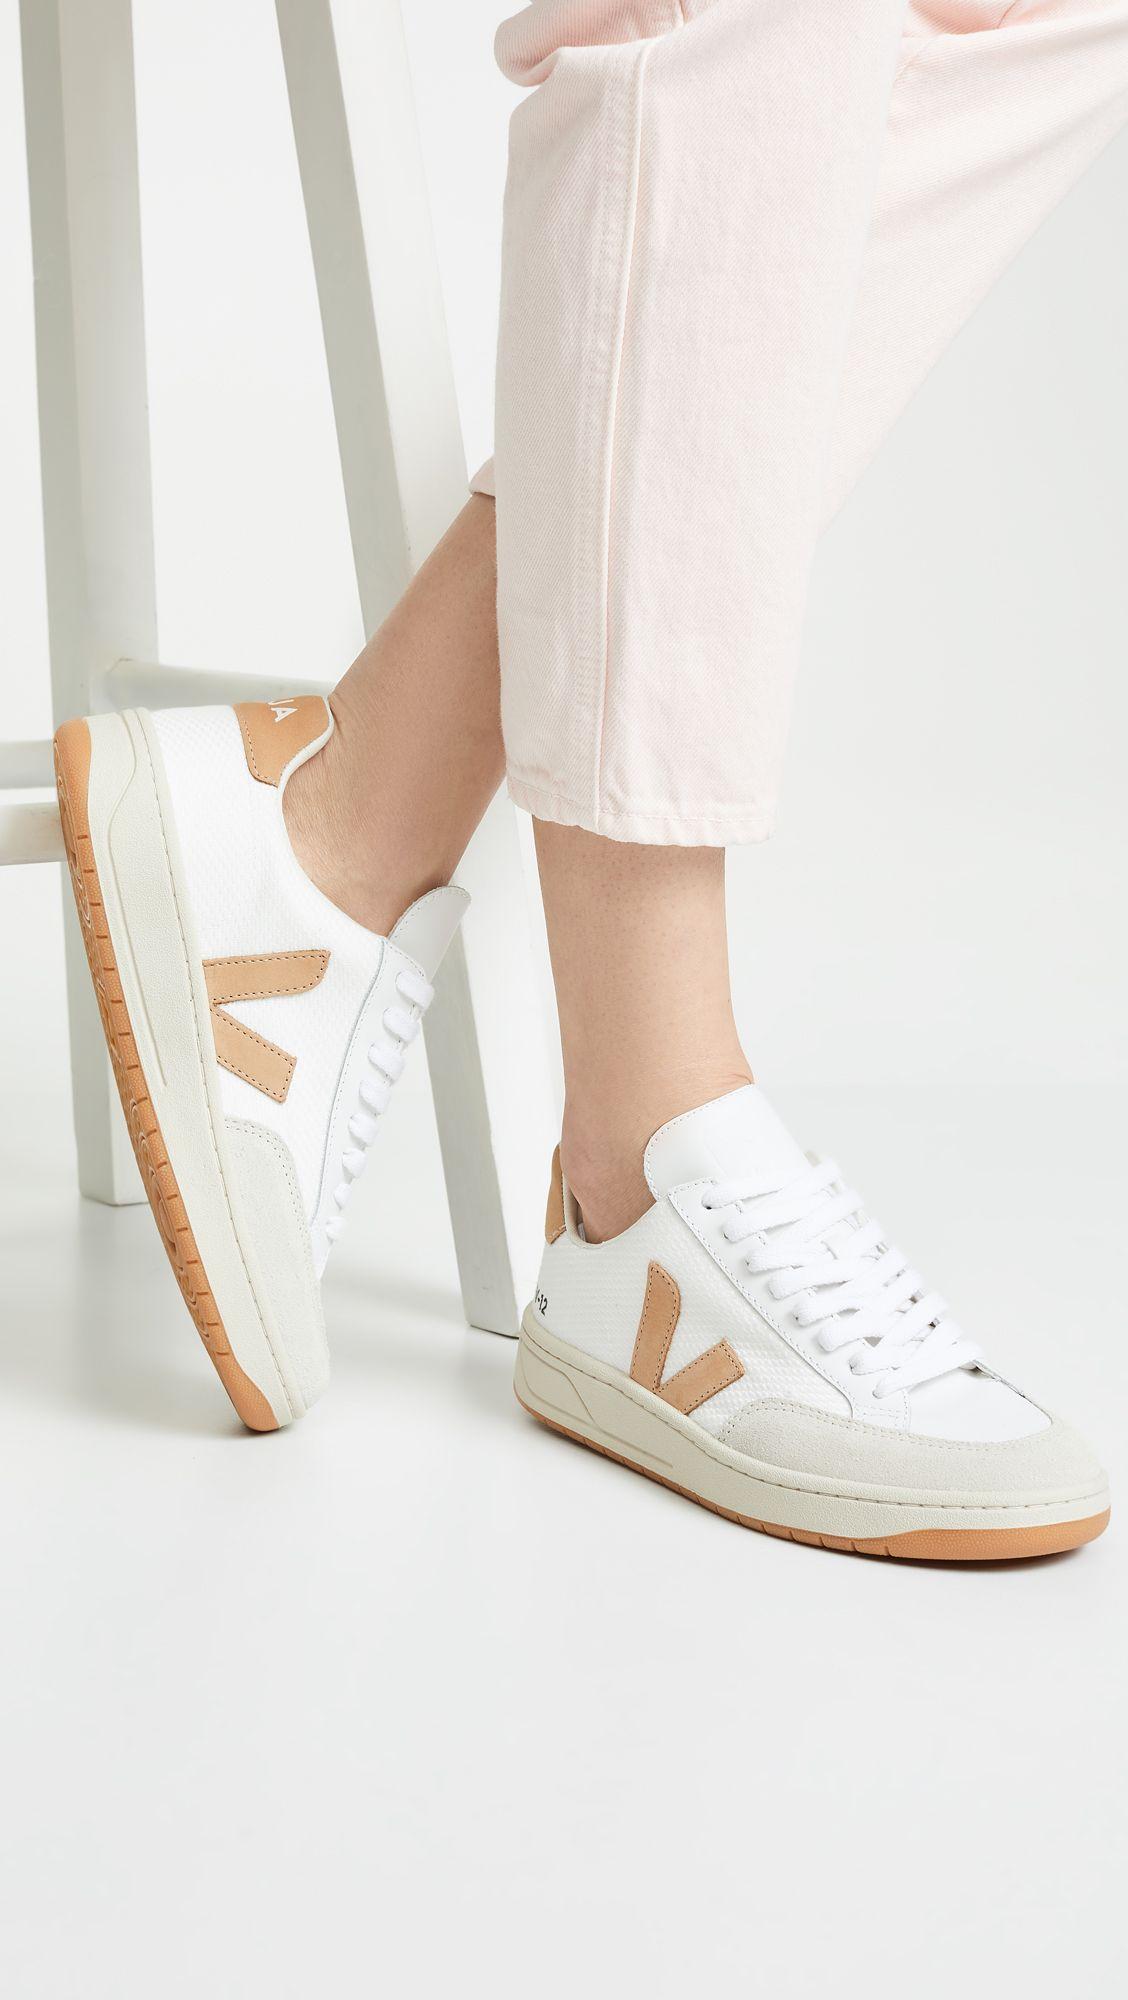 Sneakers, Veja shoes, Womens sneakers